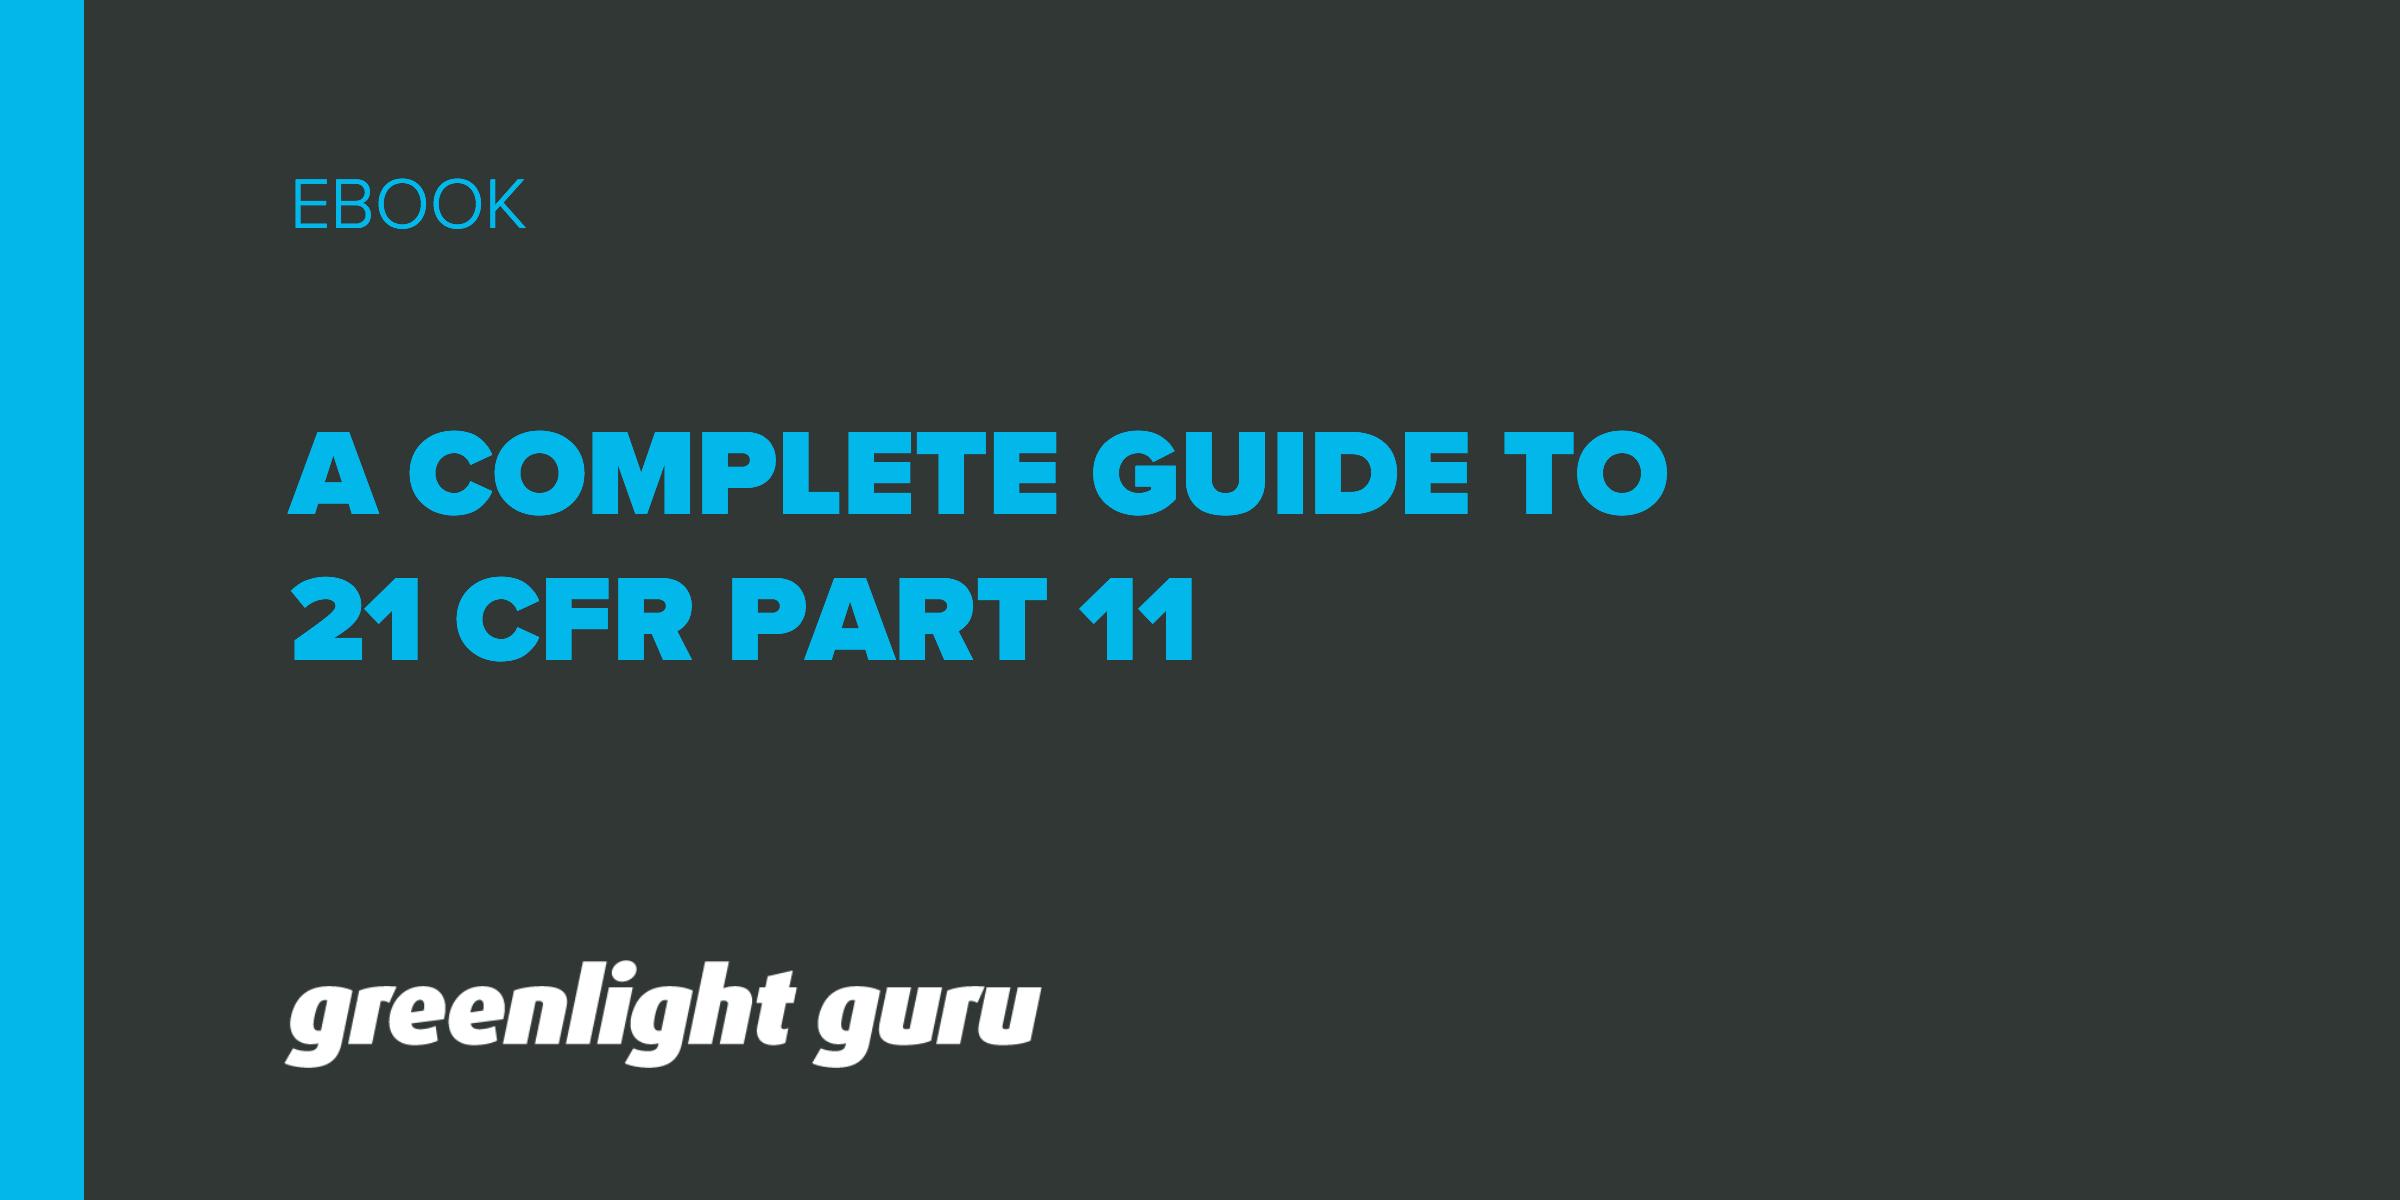 21-cfr-part 11-guide (1)